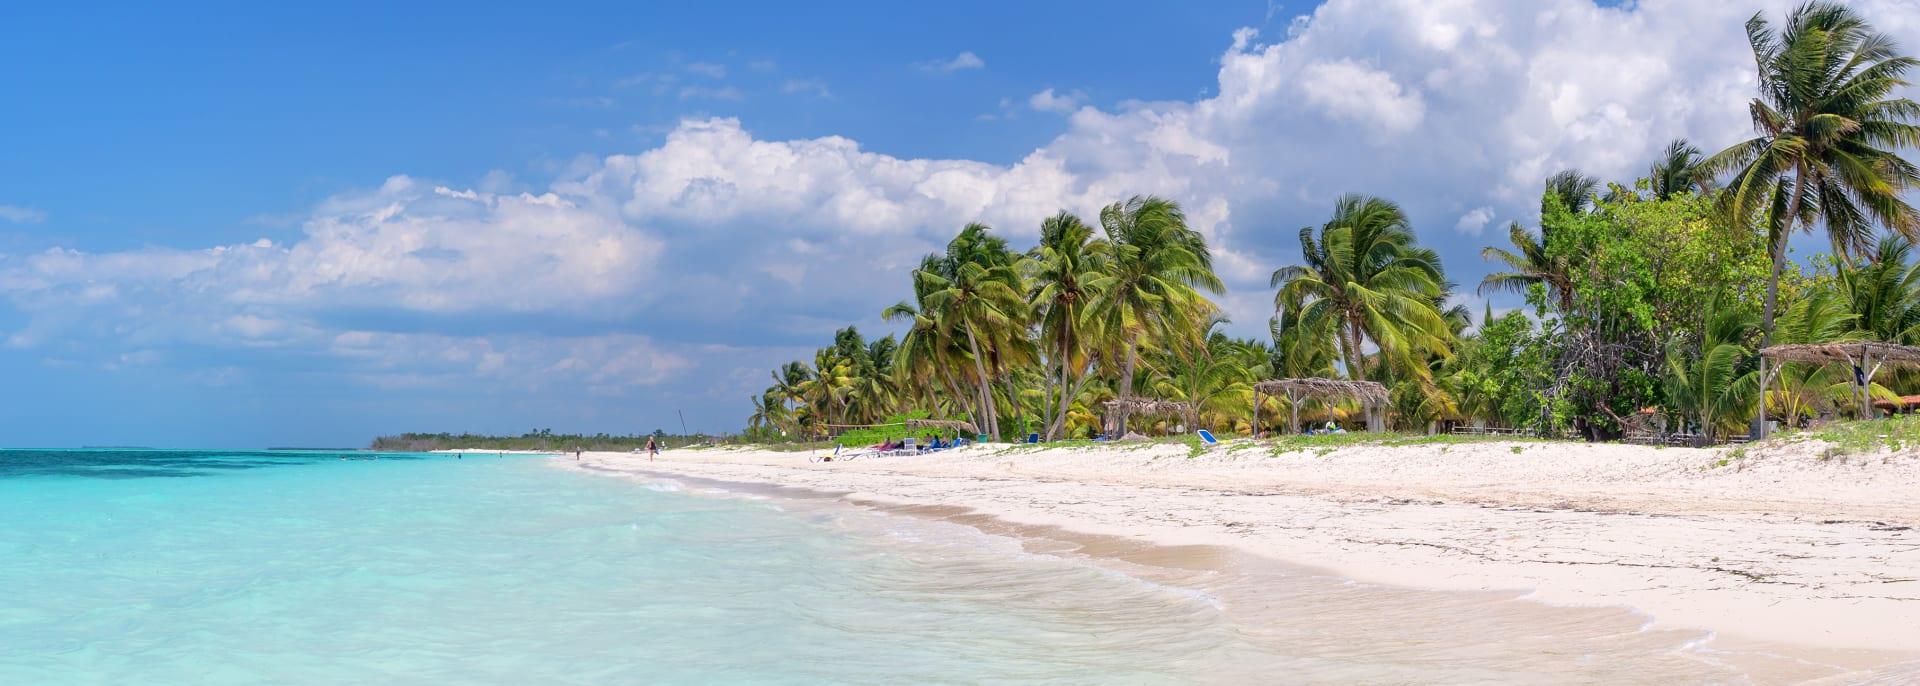 Panorama des Strandes der Insel Cayo Levisa, Kuba